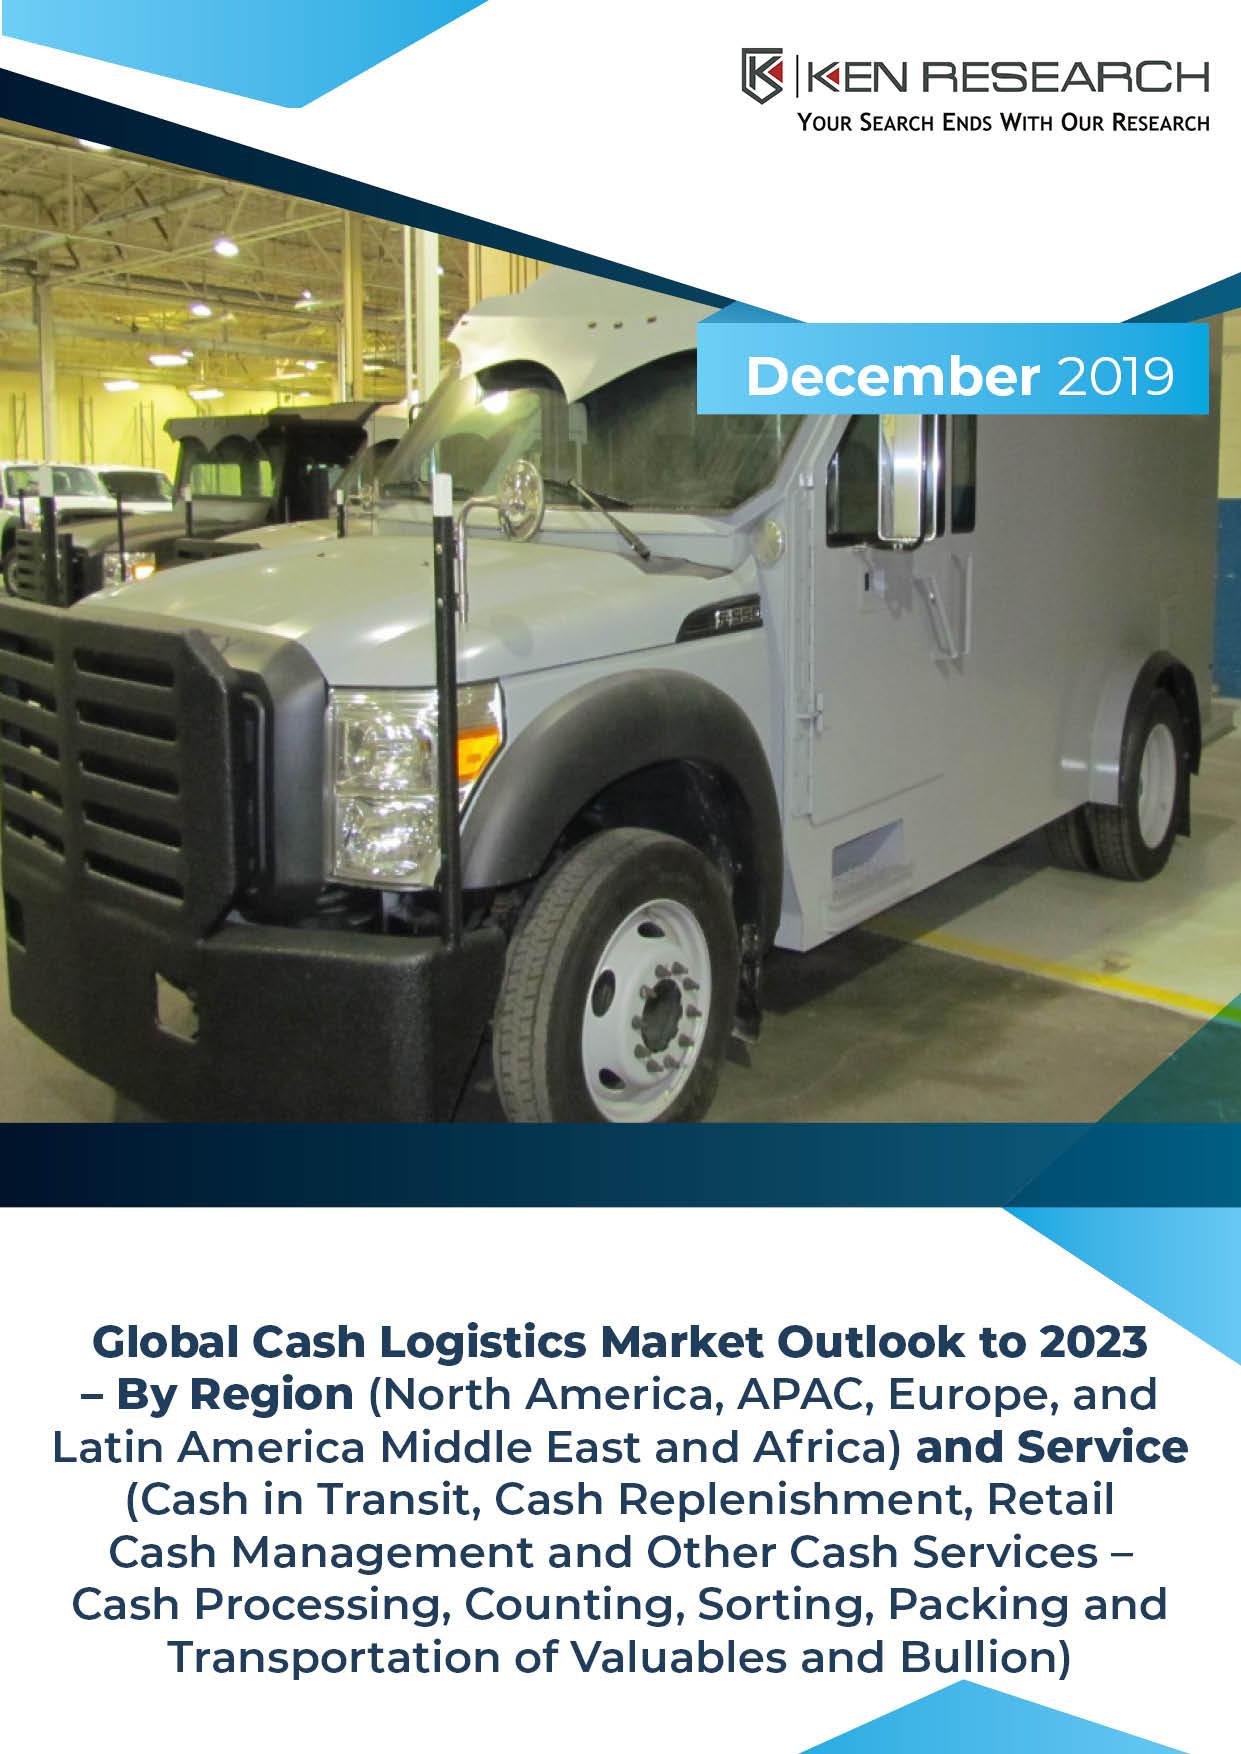 Global-Cash-Logistics-Market-1.jpg